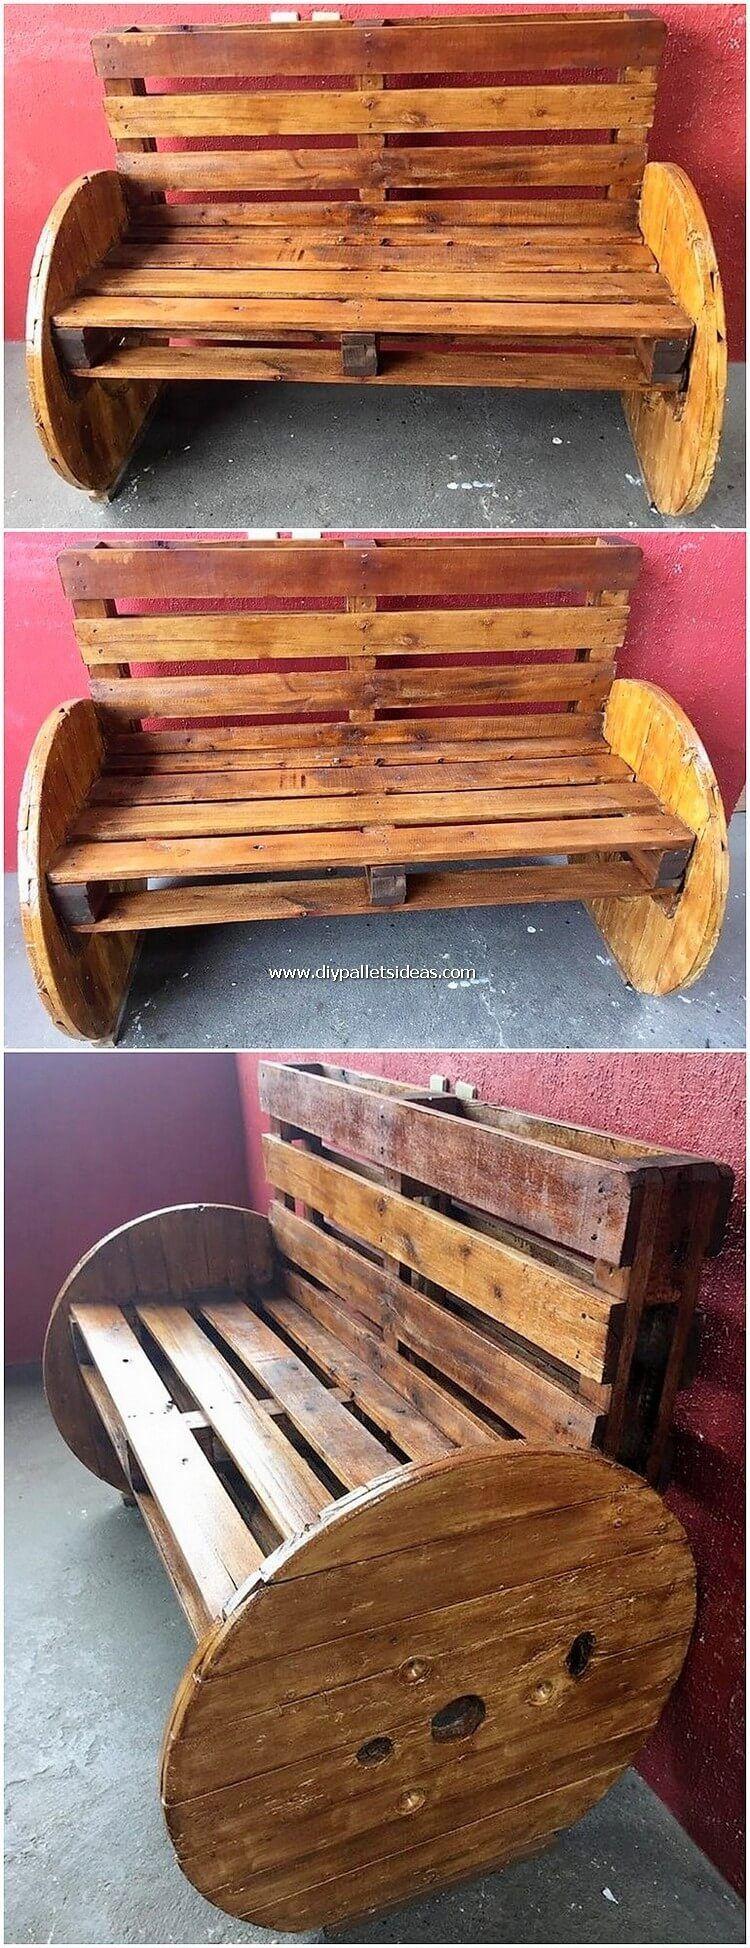 latest and fresh diy wood pallet ideas 2019 pallet furniture rh pinterest com